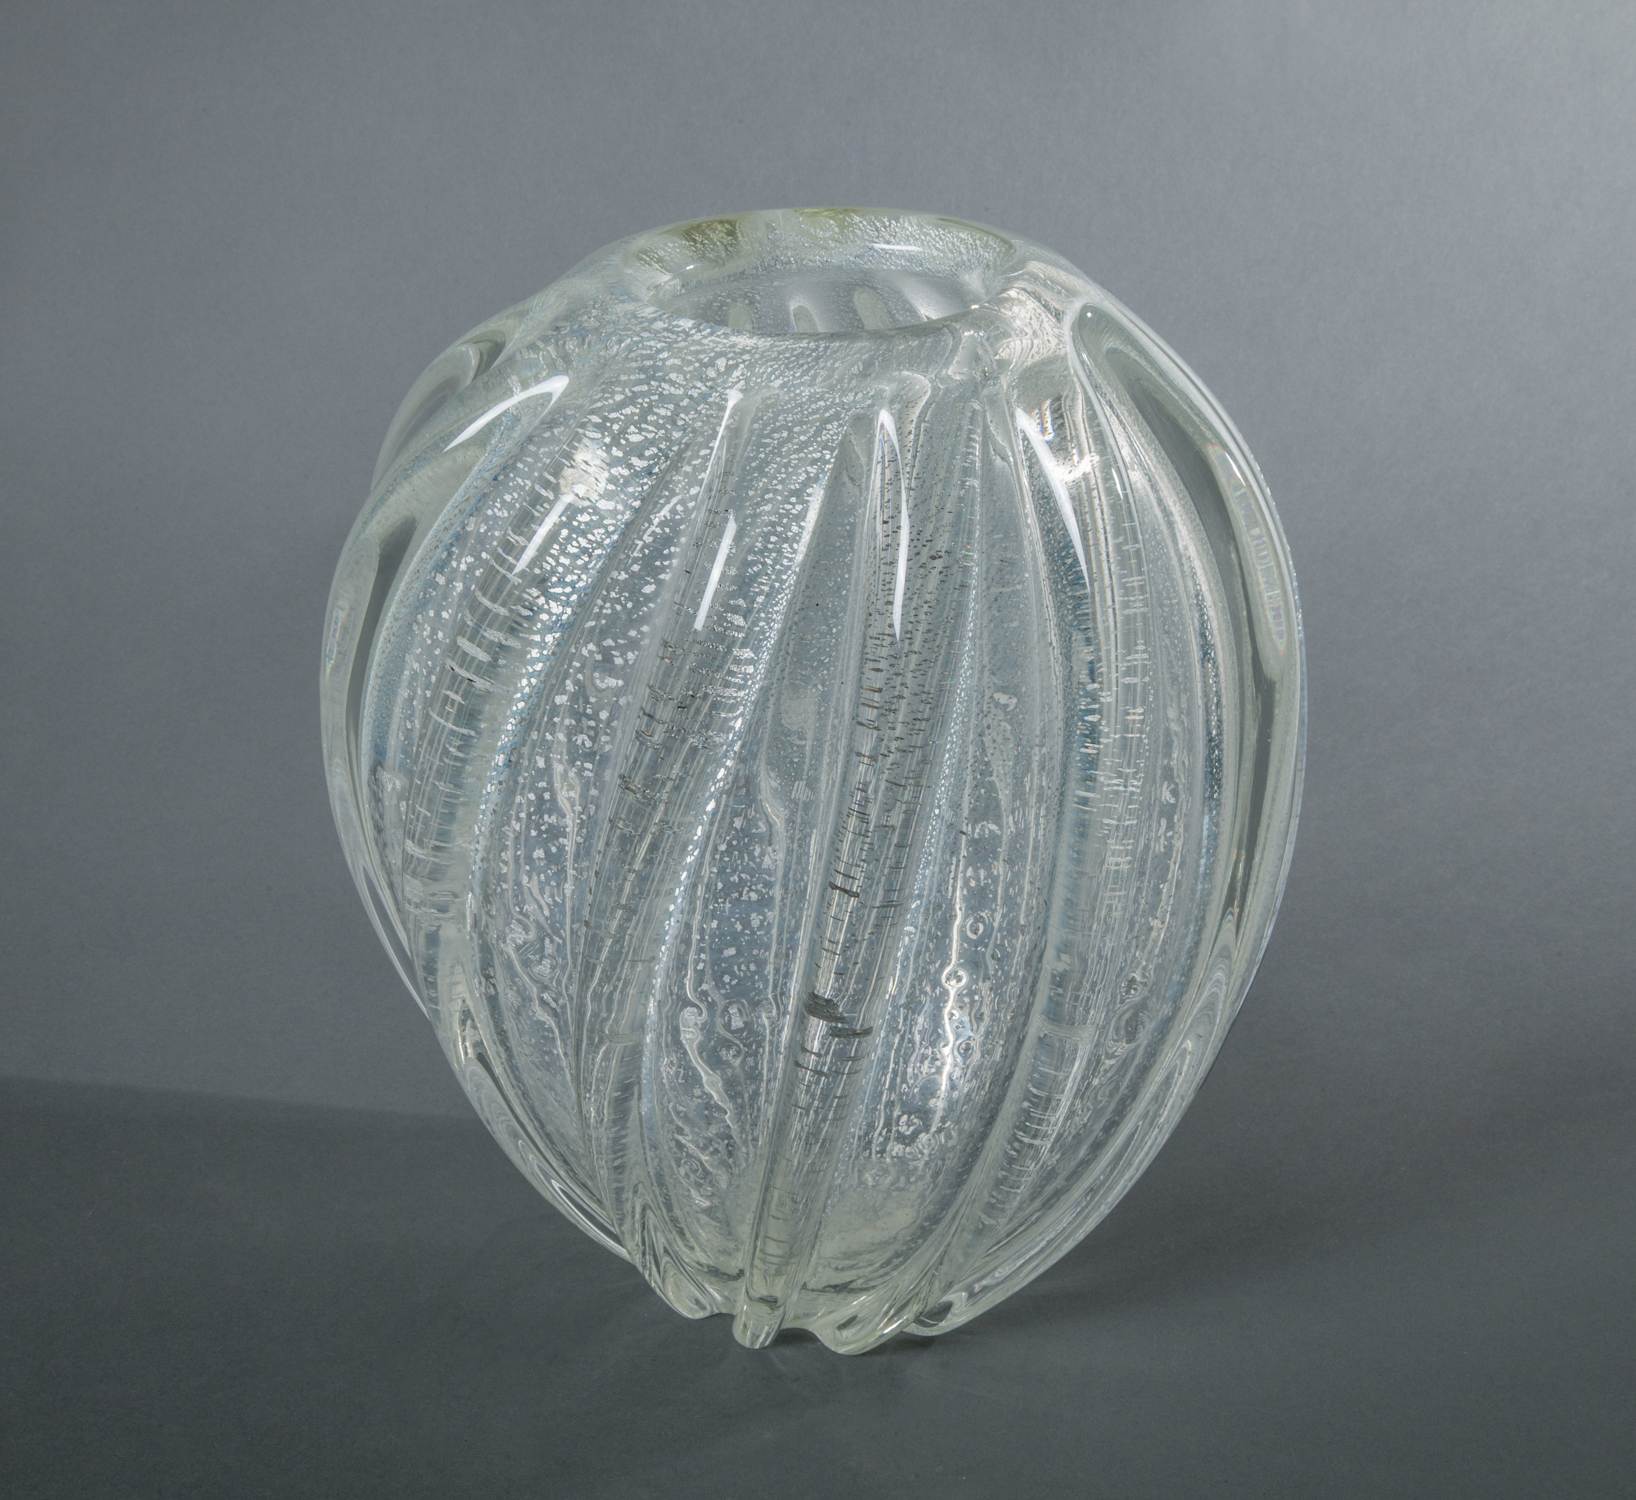 seguso, murano, glass vase